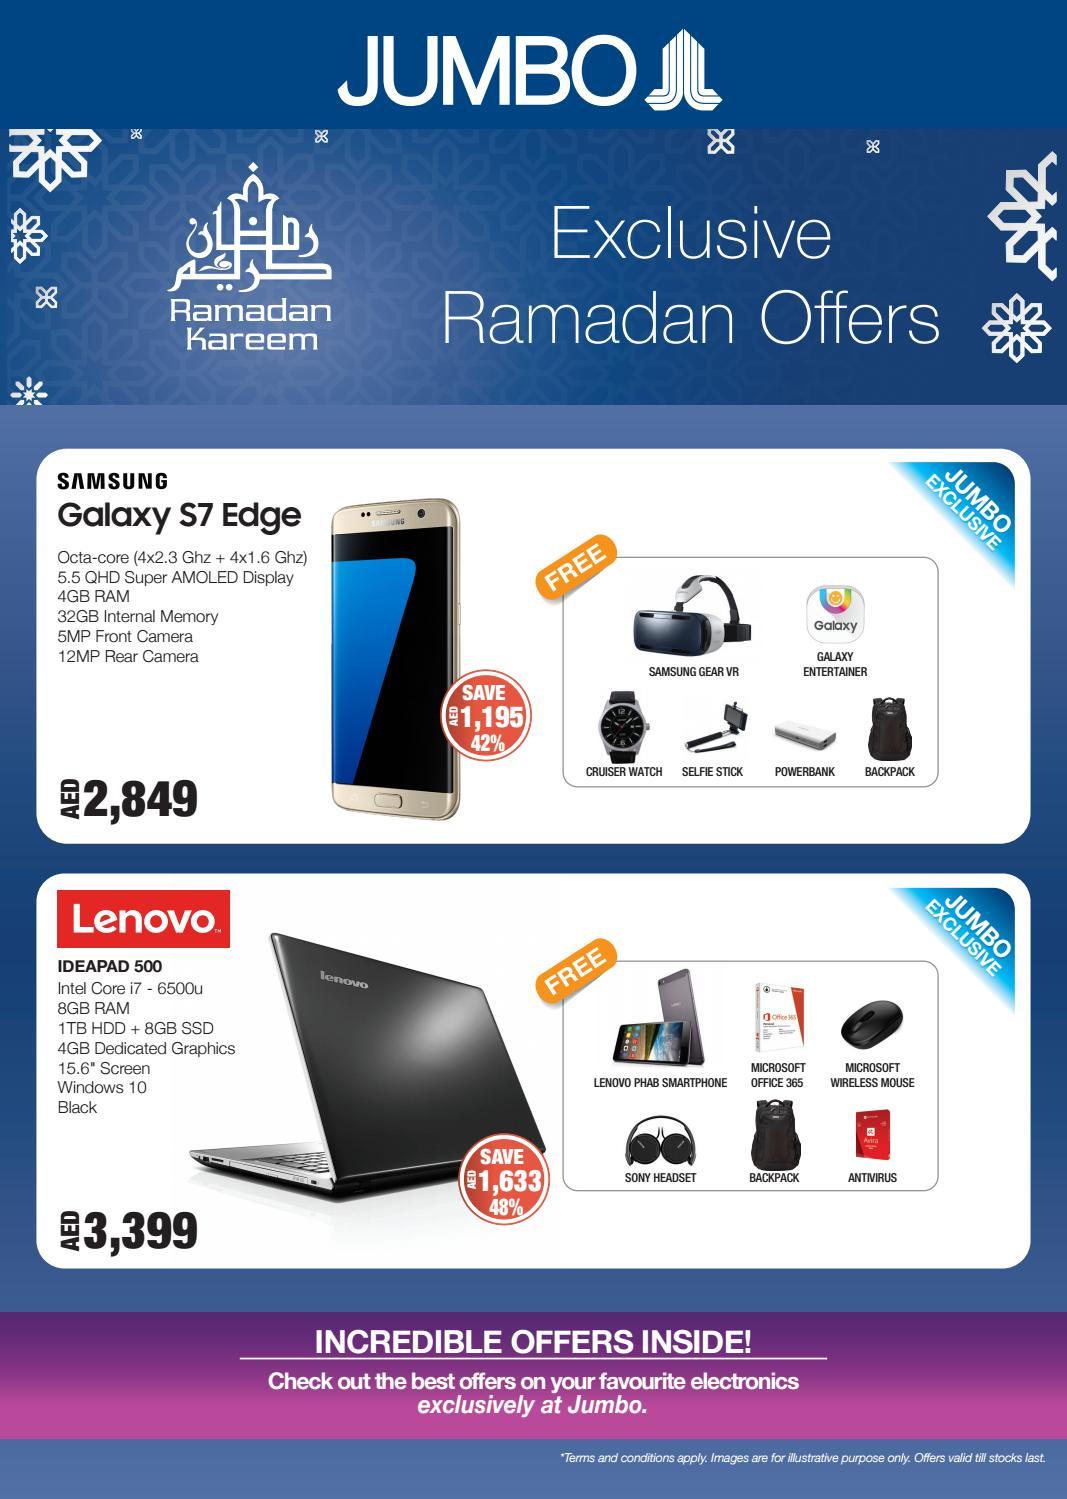 Tempat Jual Samsung Galaxy J1 Ace Ve J111f Smartphone White 8gb 1gb Hitam Shoppinginformercom By Shopping Informer Issuu D